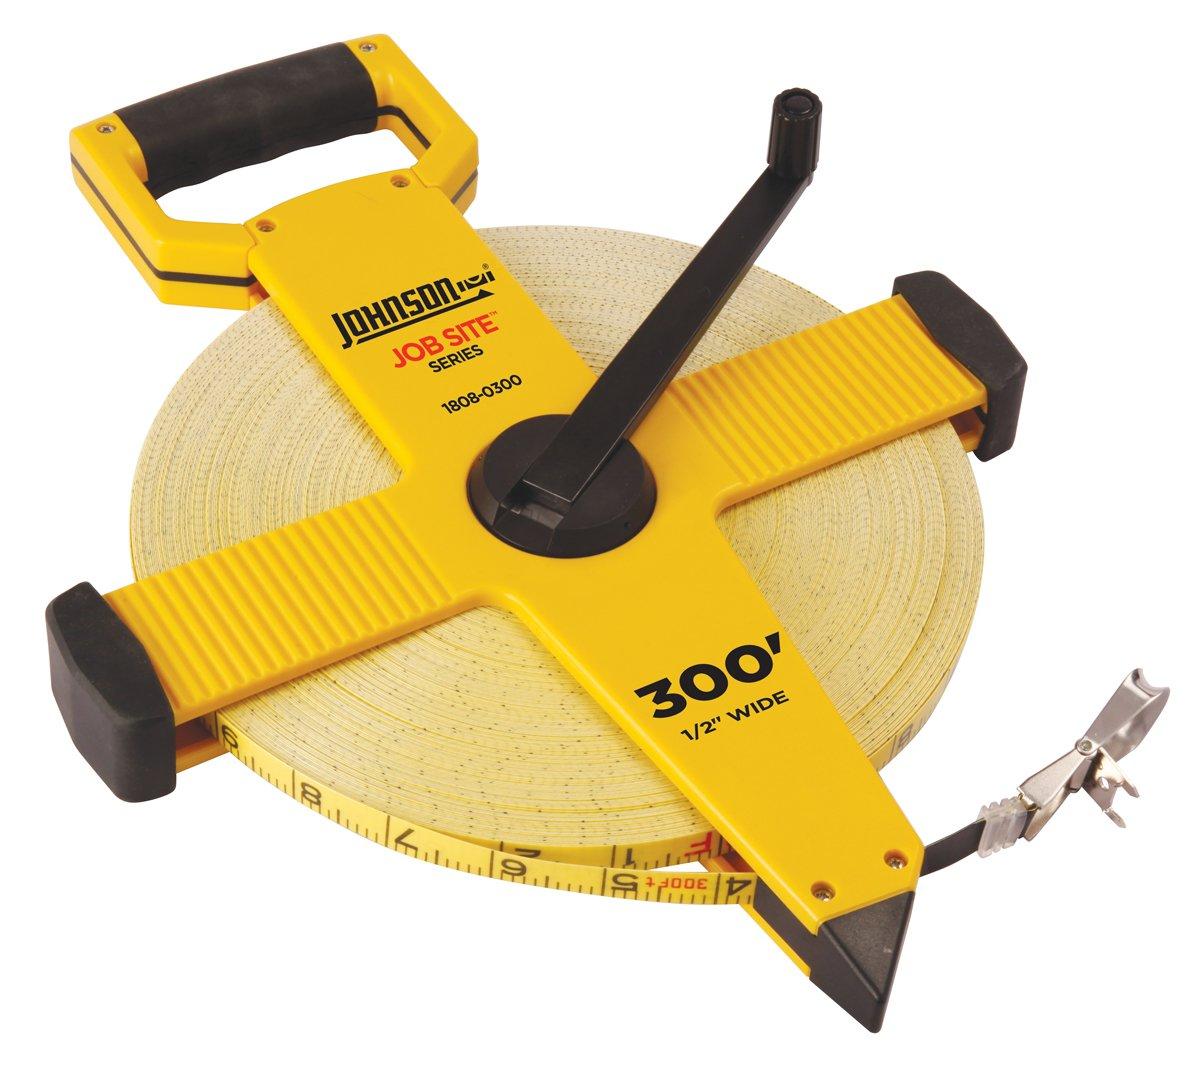 Johnson Level and Tool 1808-0300 300-Foot JobSite Open Reel Fiberglass Tape